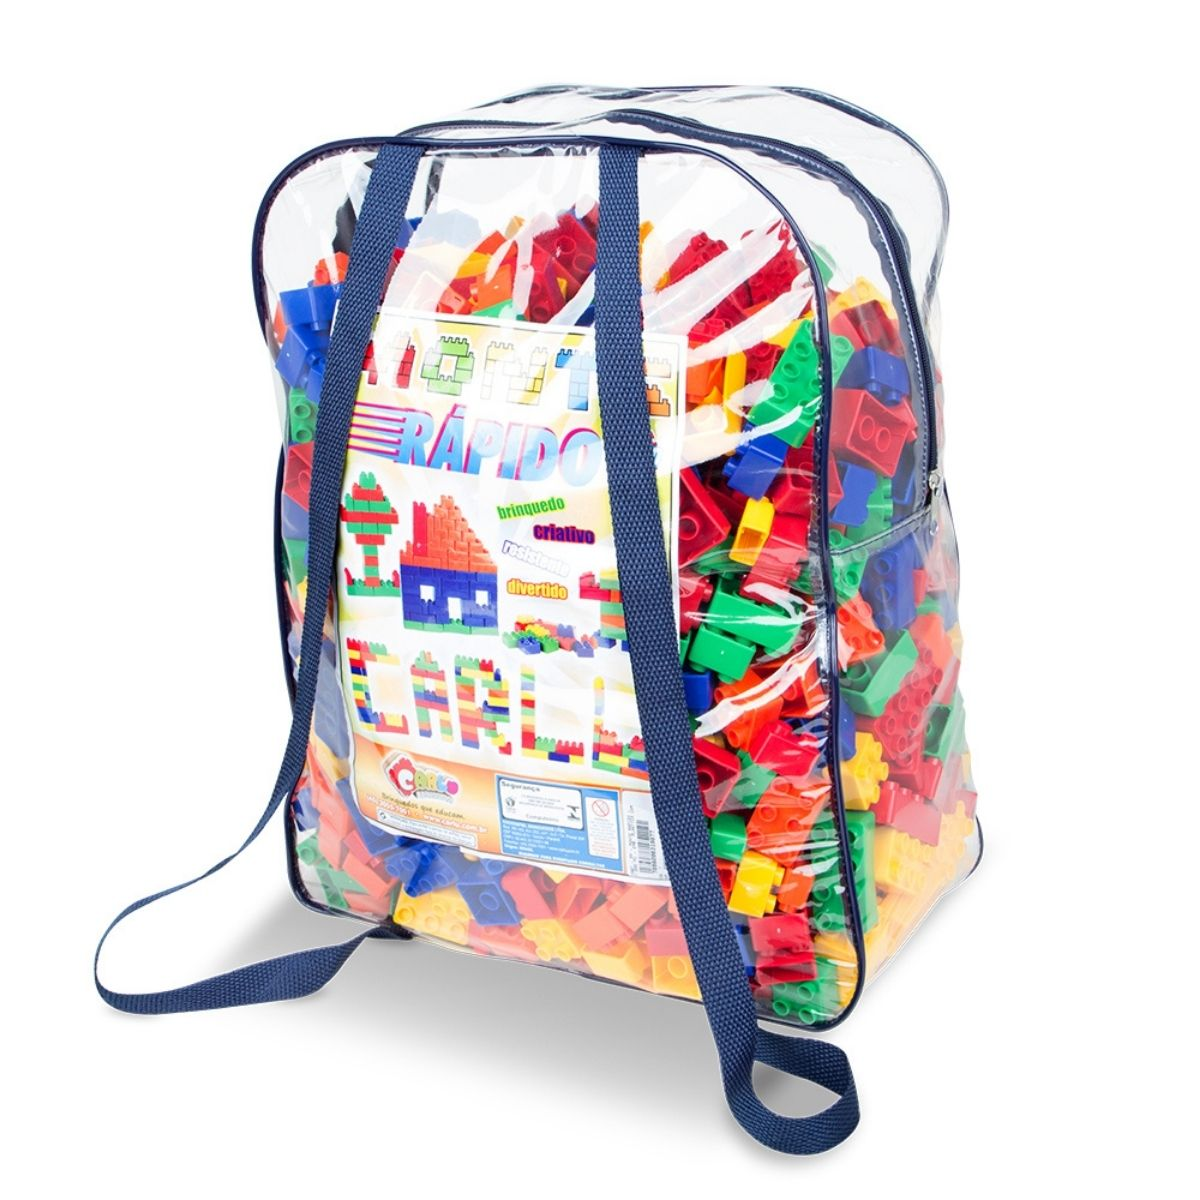 Brinquedo Educativo Conectando Formas - 1000 peças